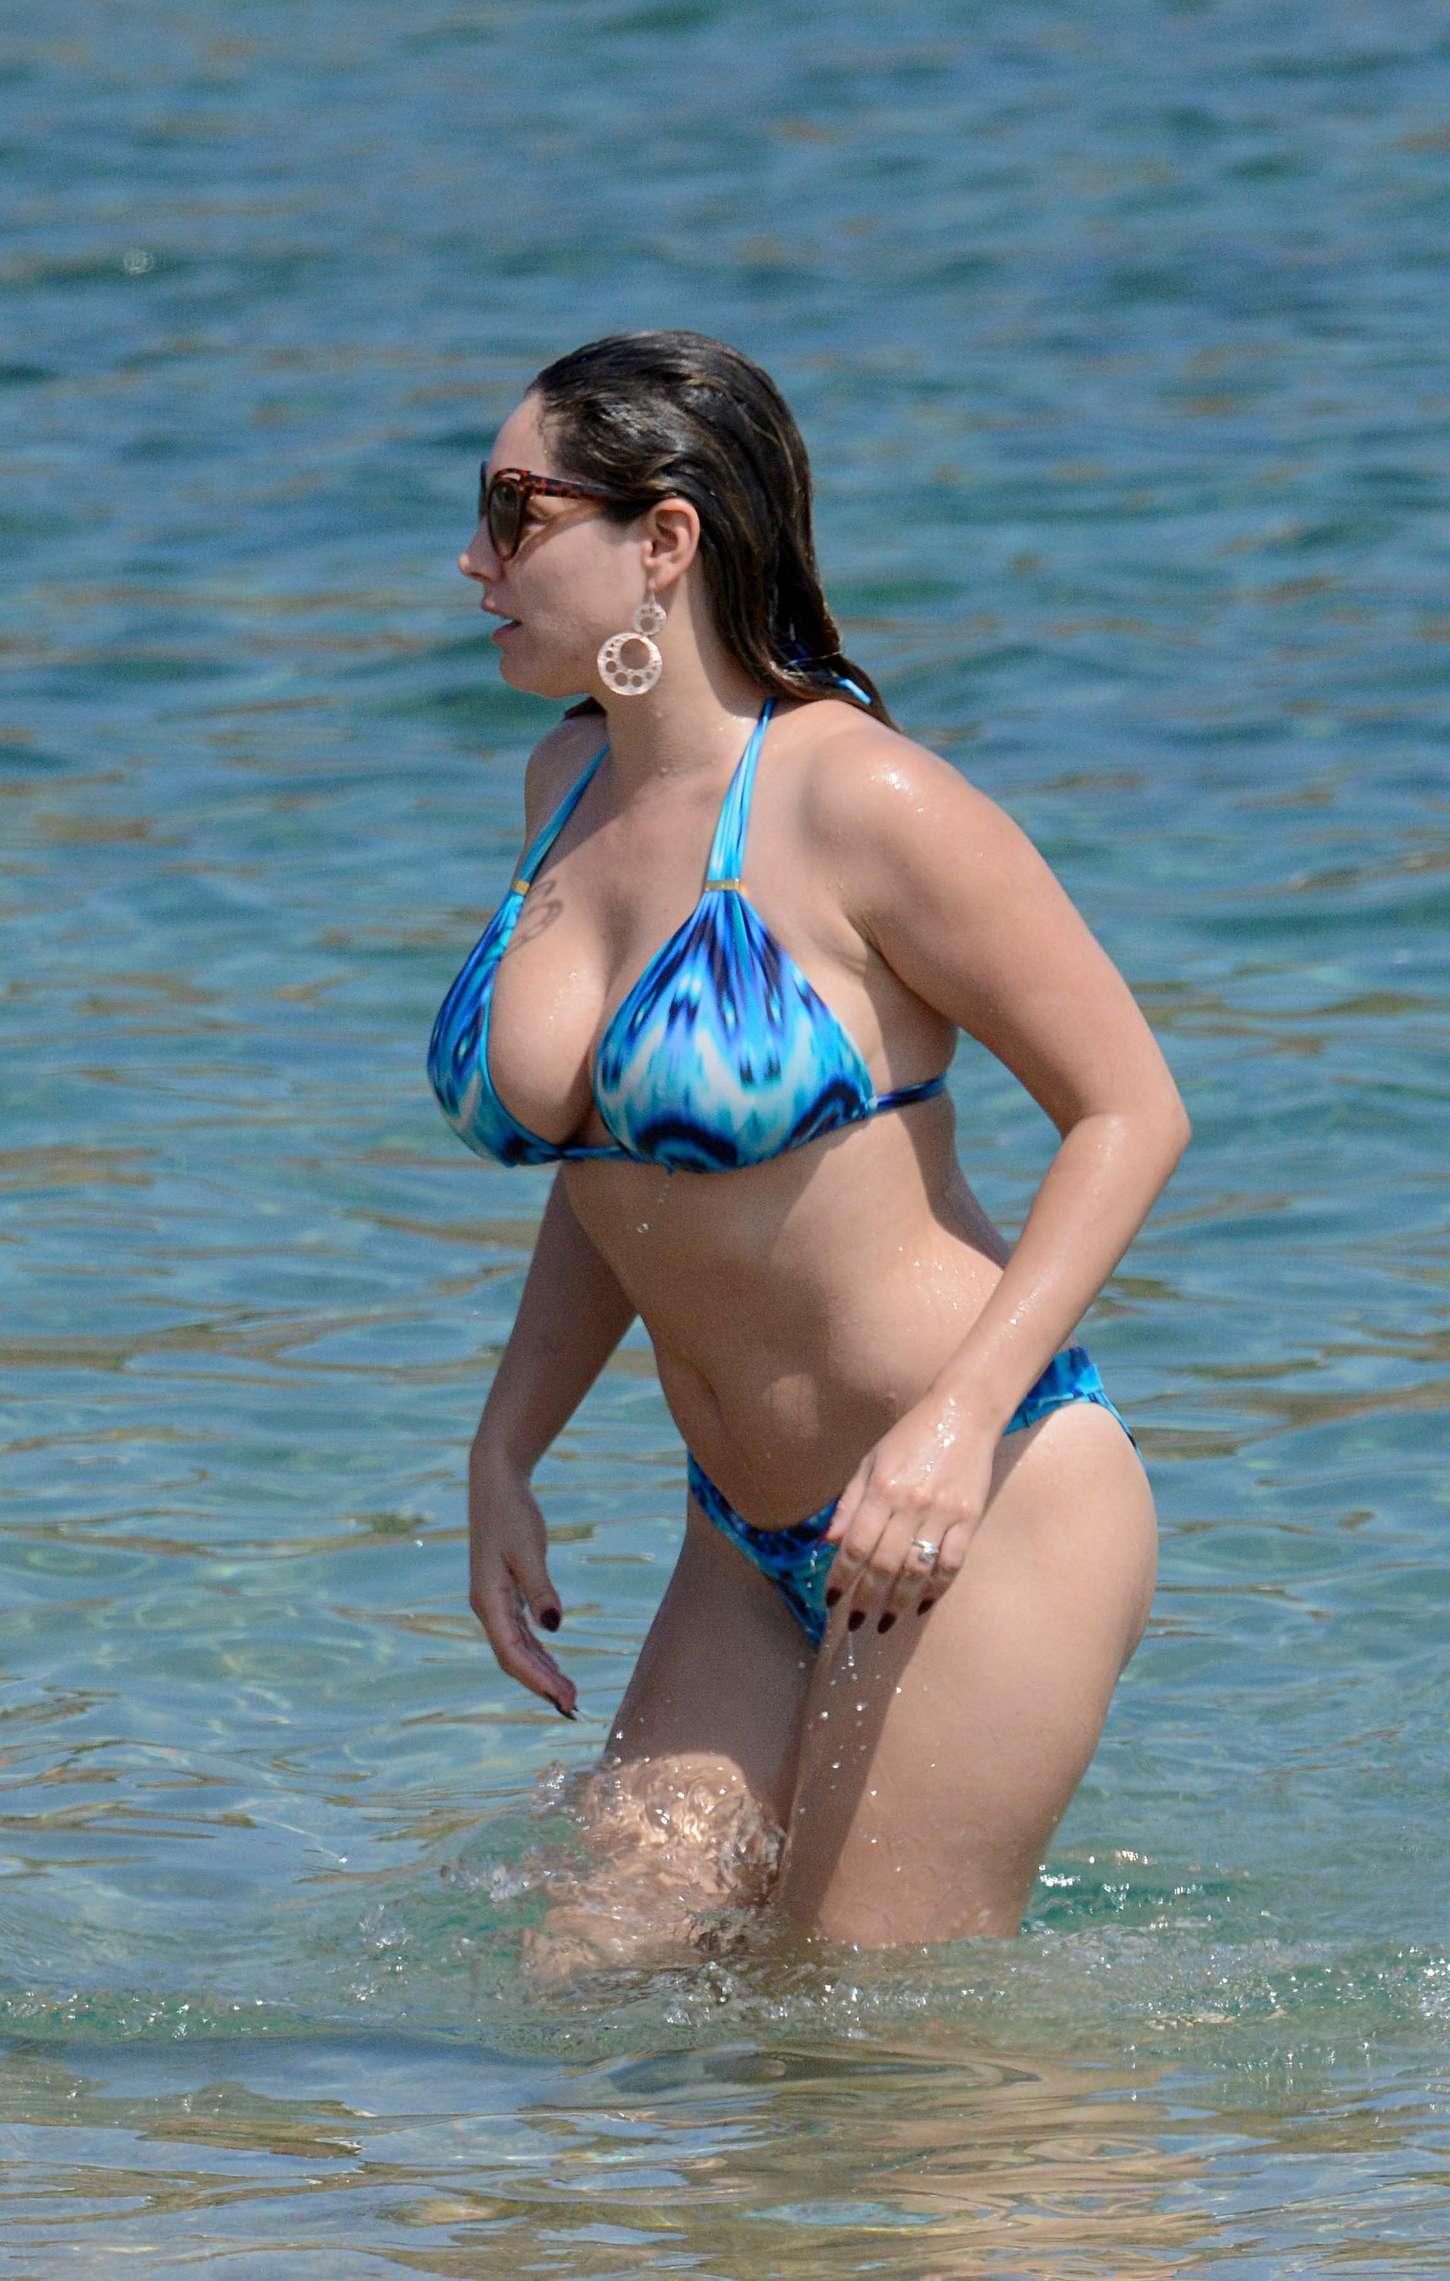 Kelly Brook in Blue Bikini on a Beach in Greece